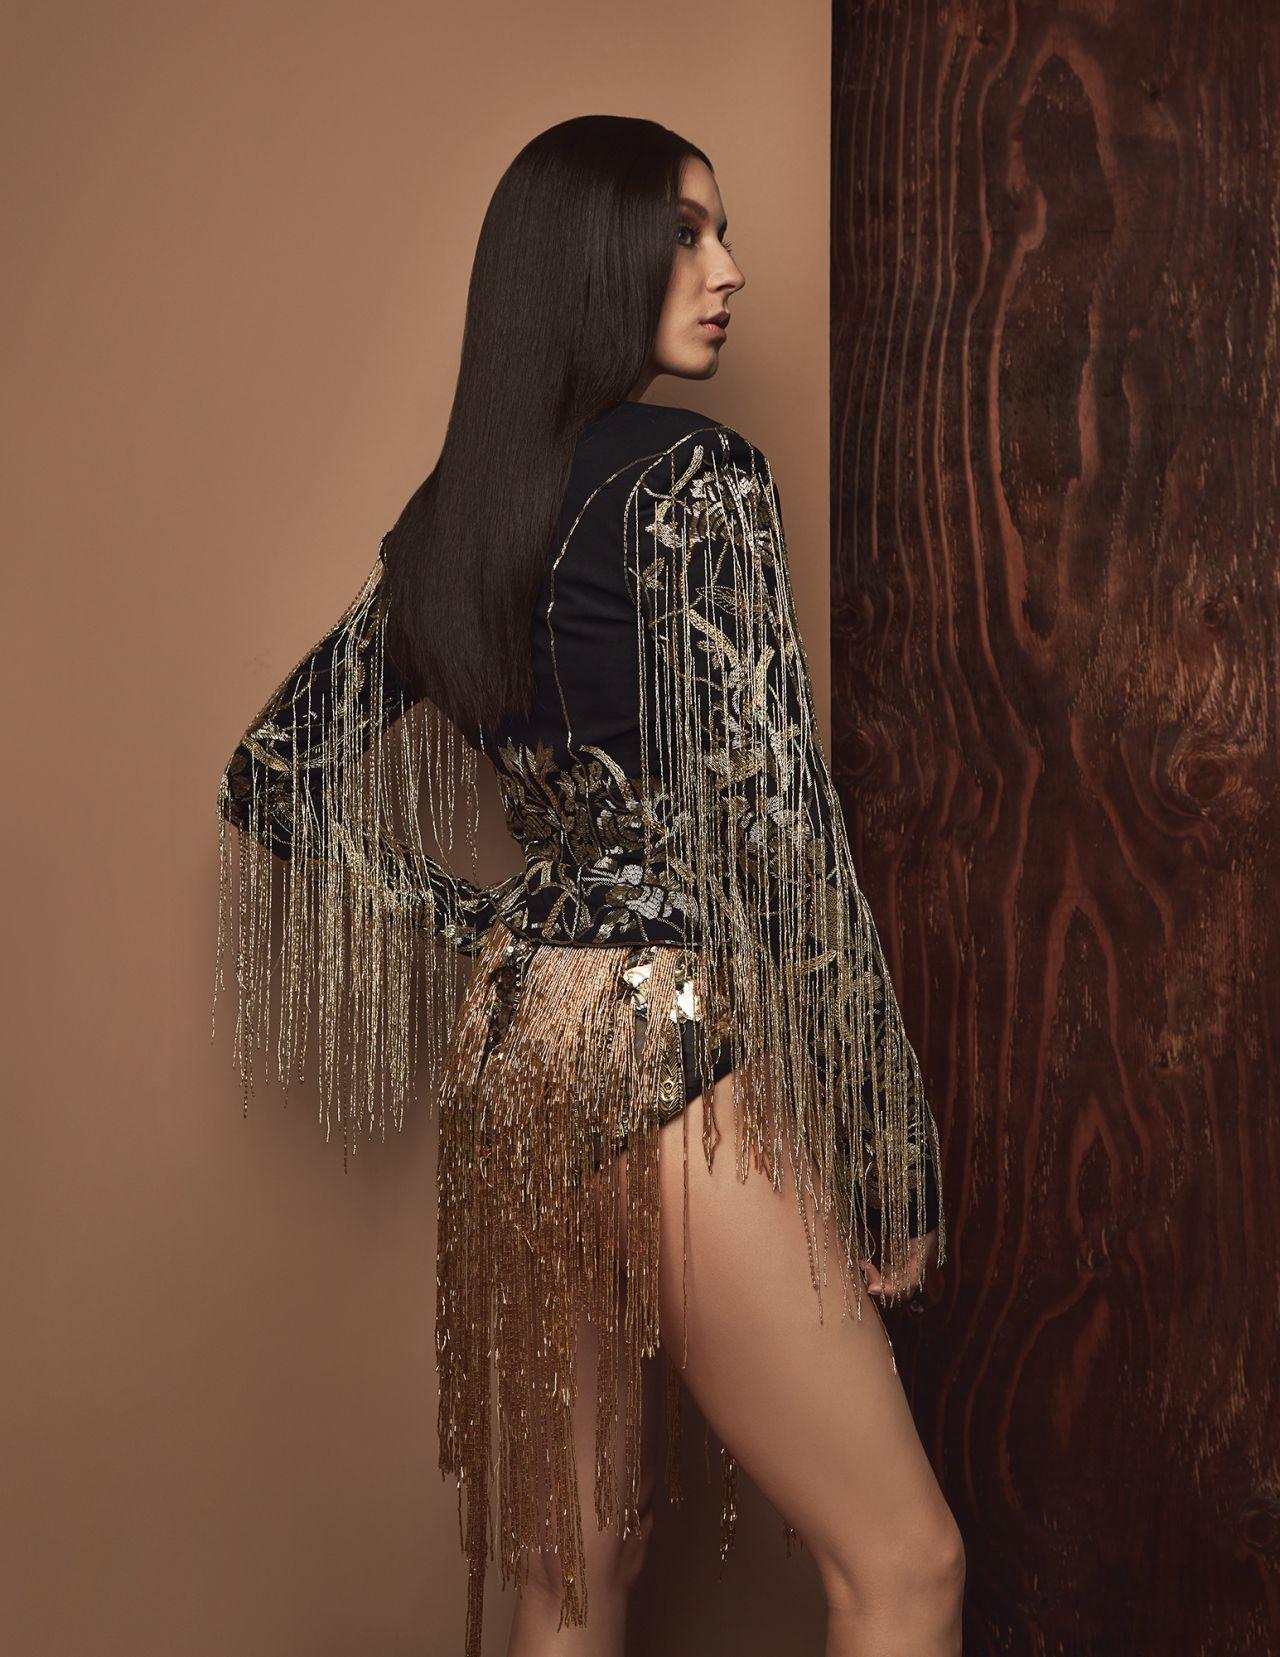 Photoshoot For Vogue Magazine November 2015: Photoshoot For Schon Magazine